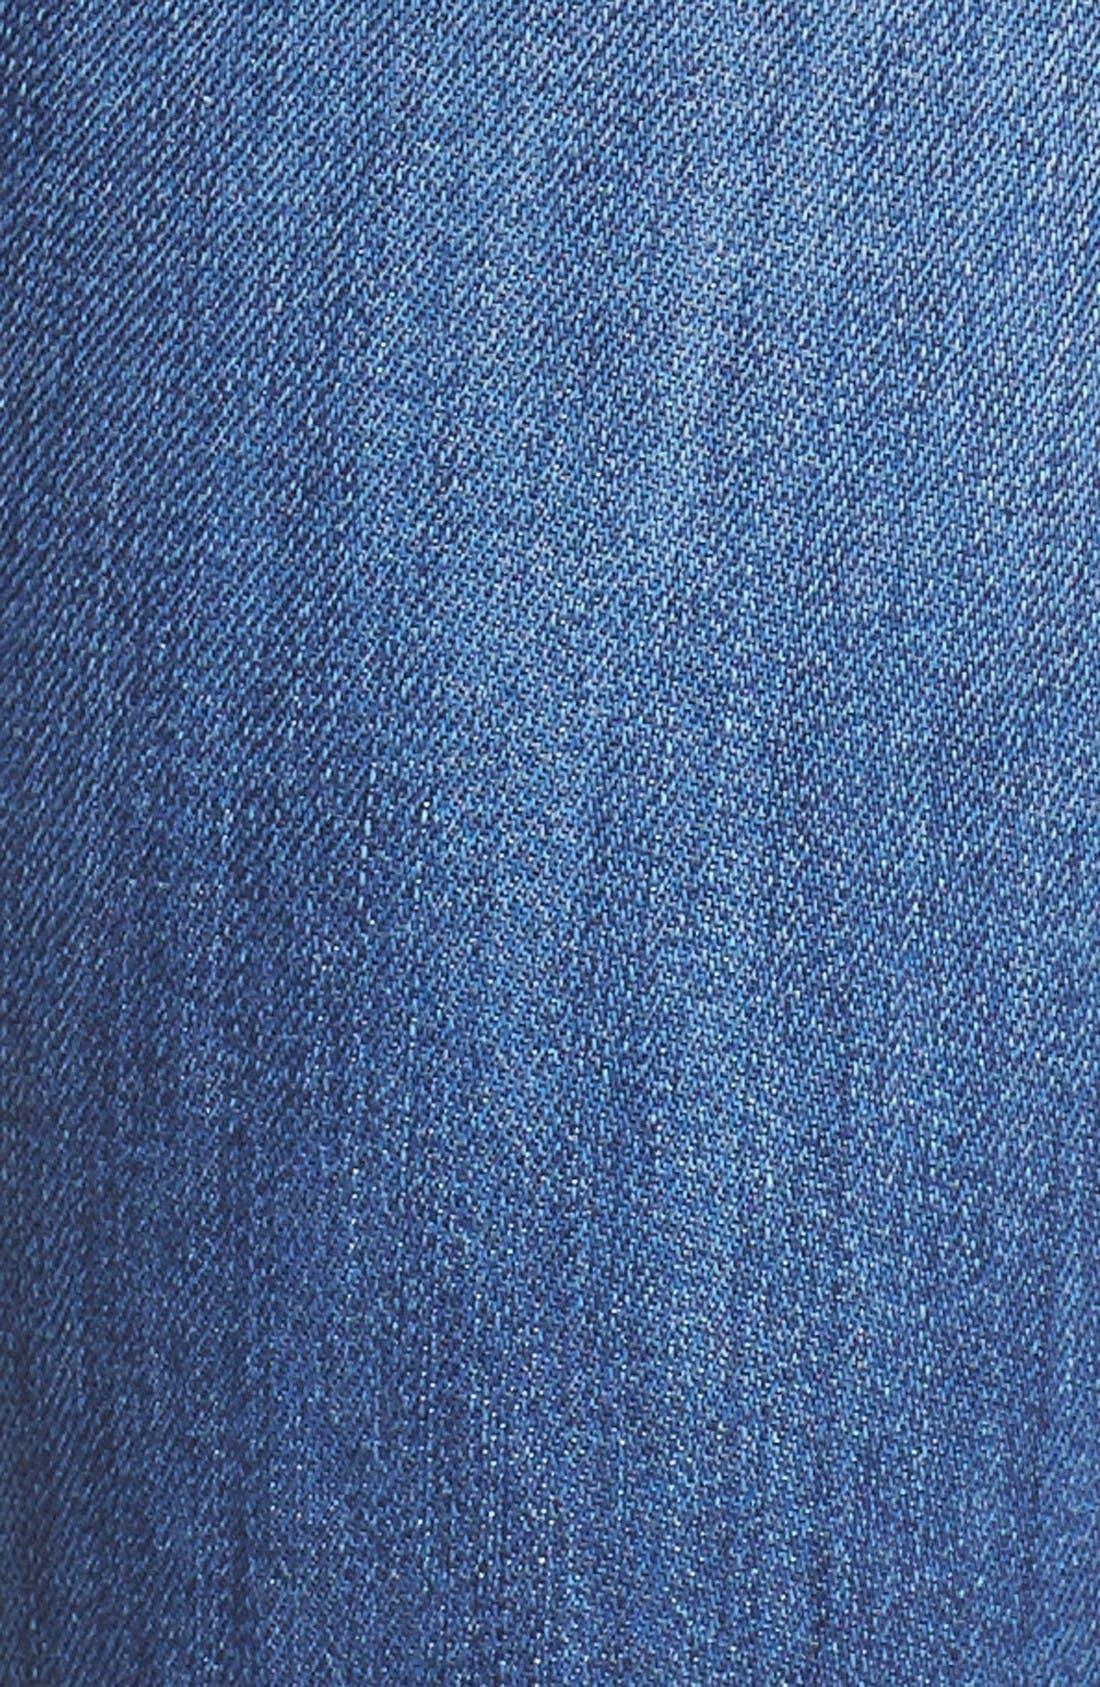 Alternate Image 5  - Hudson Tally Crop Skinny Jeans (Encounter)